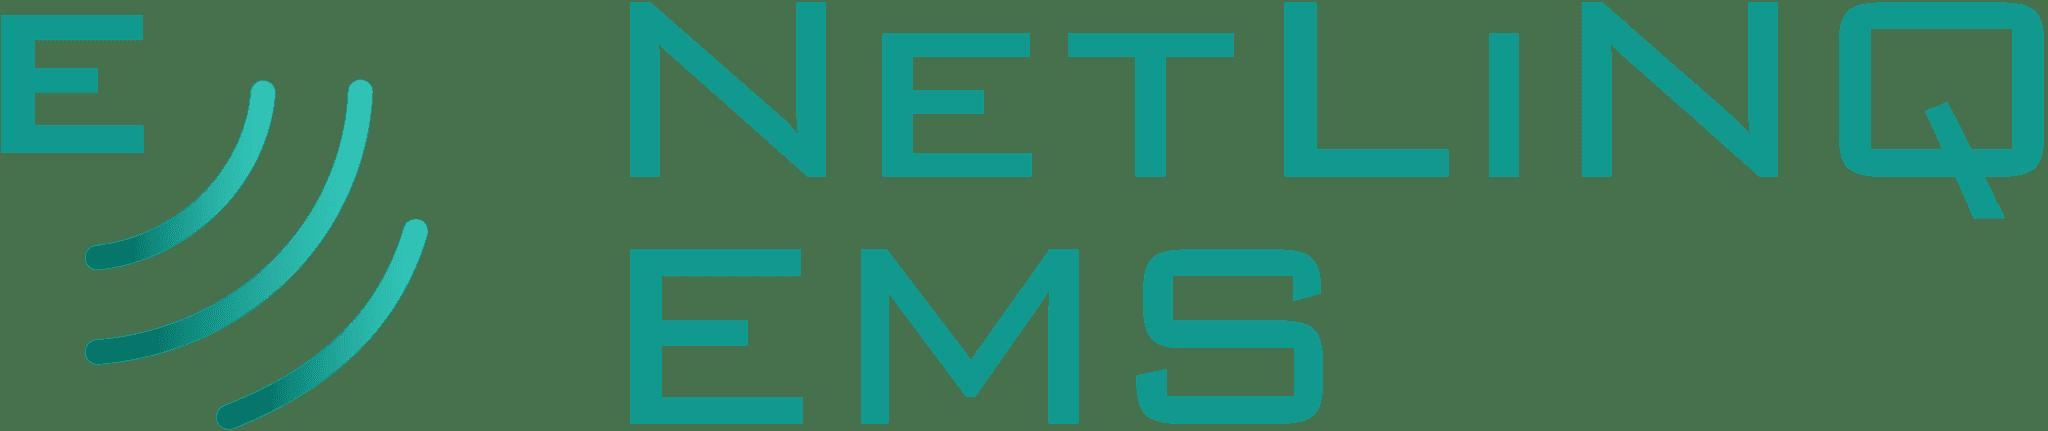 cloud-based wireless network management dashboard platform